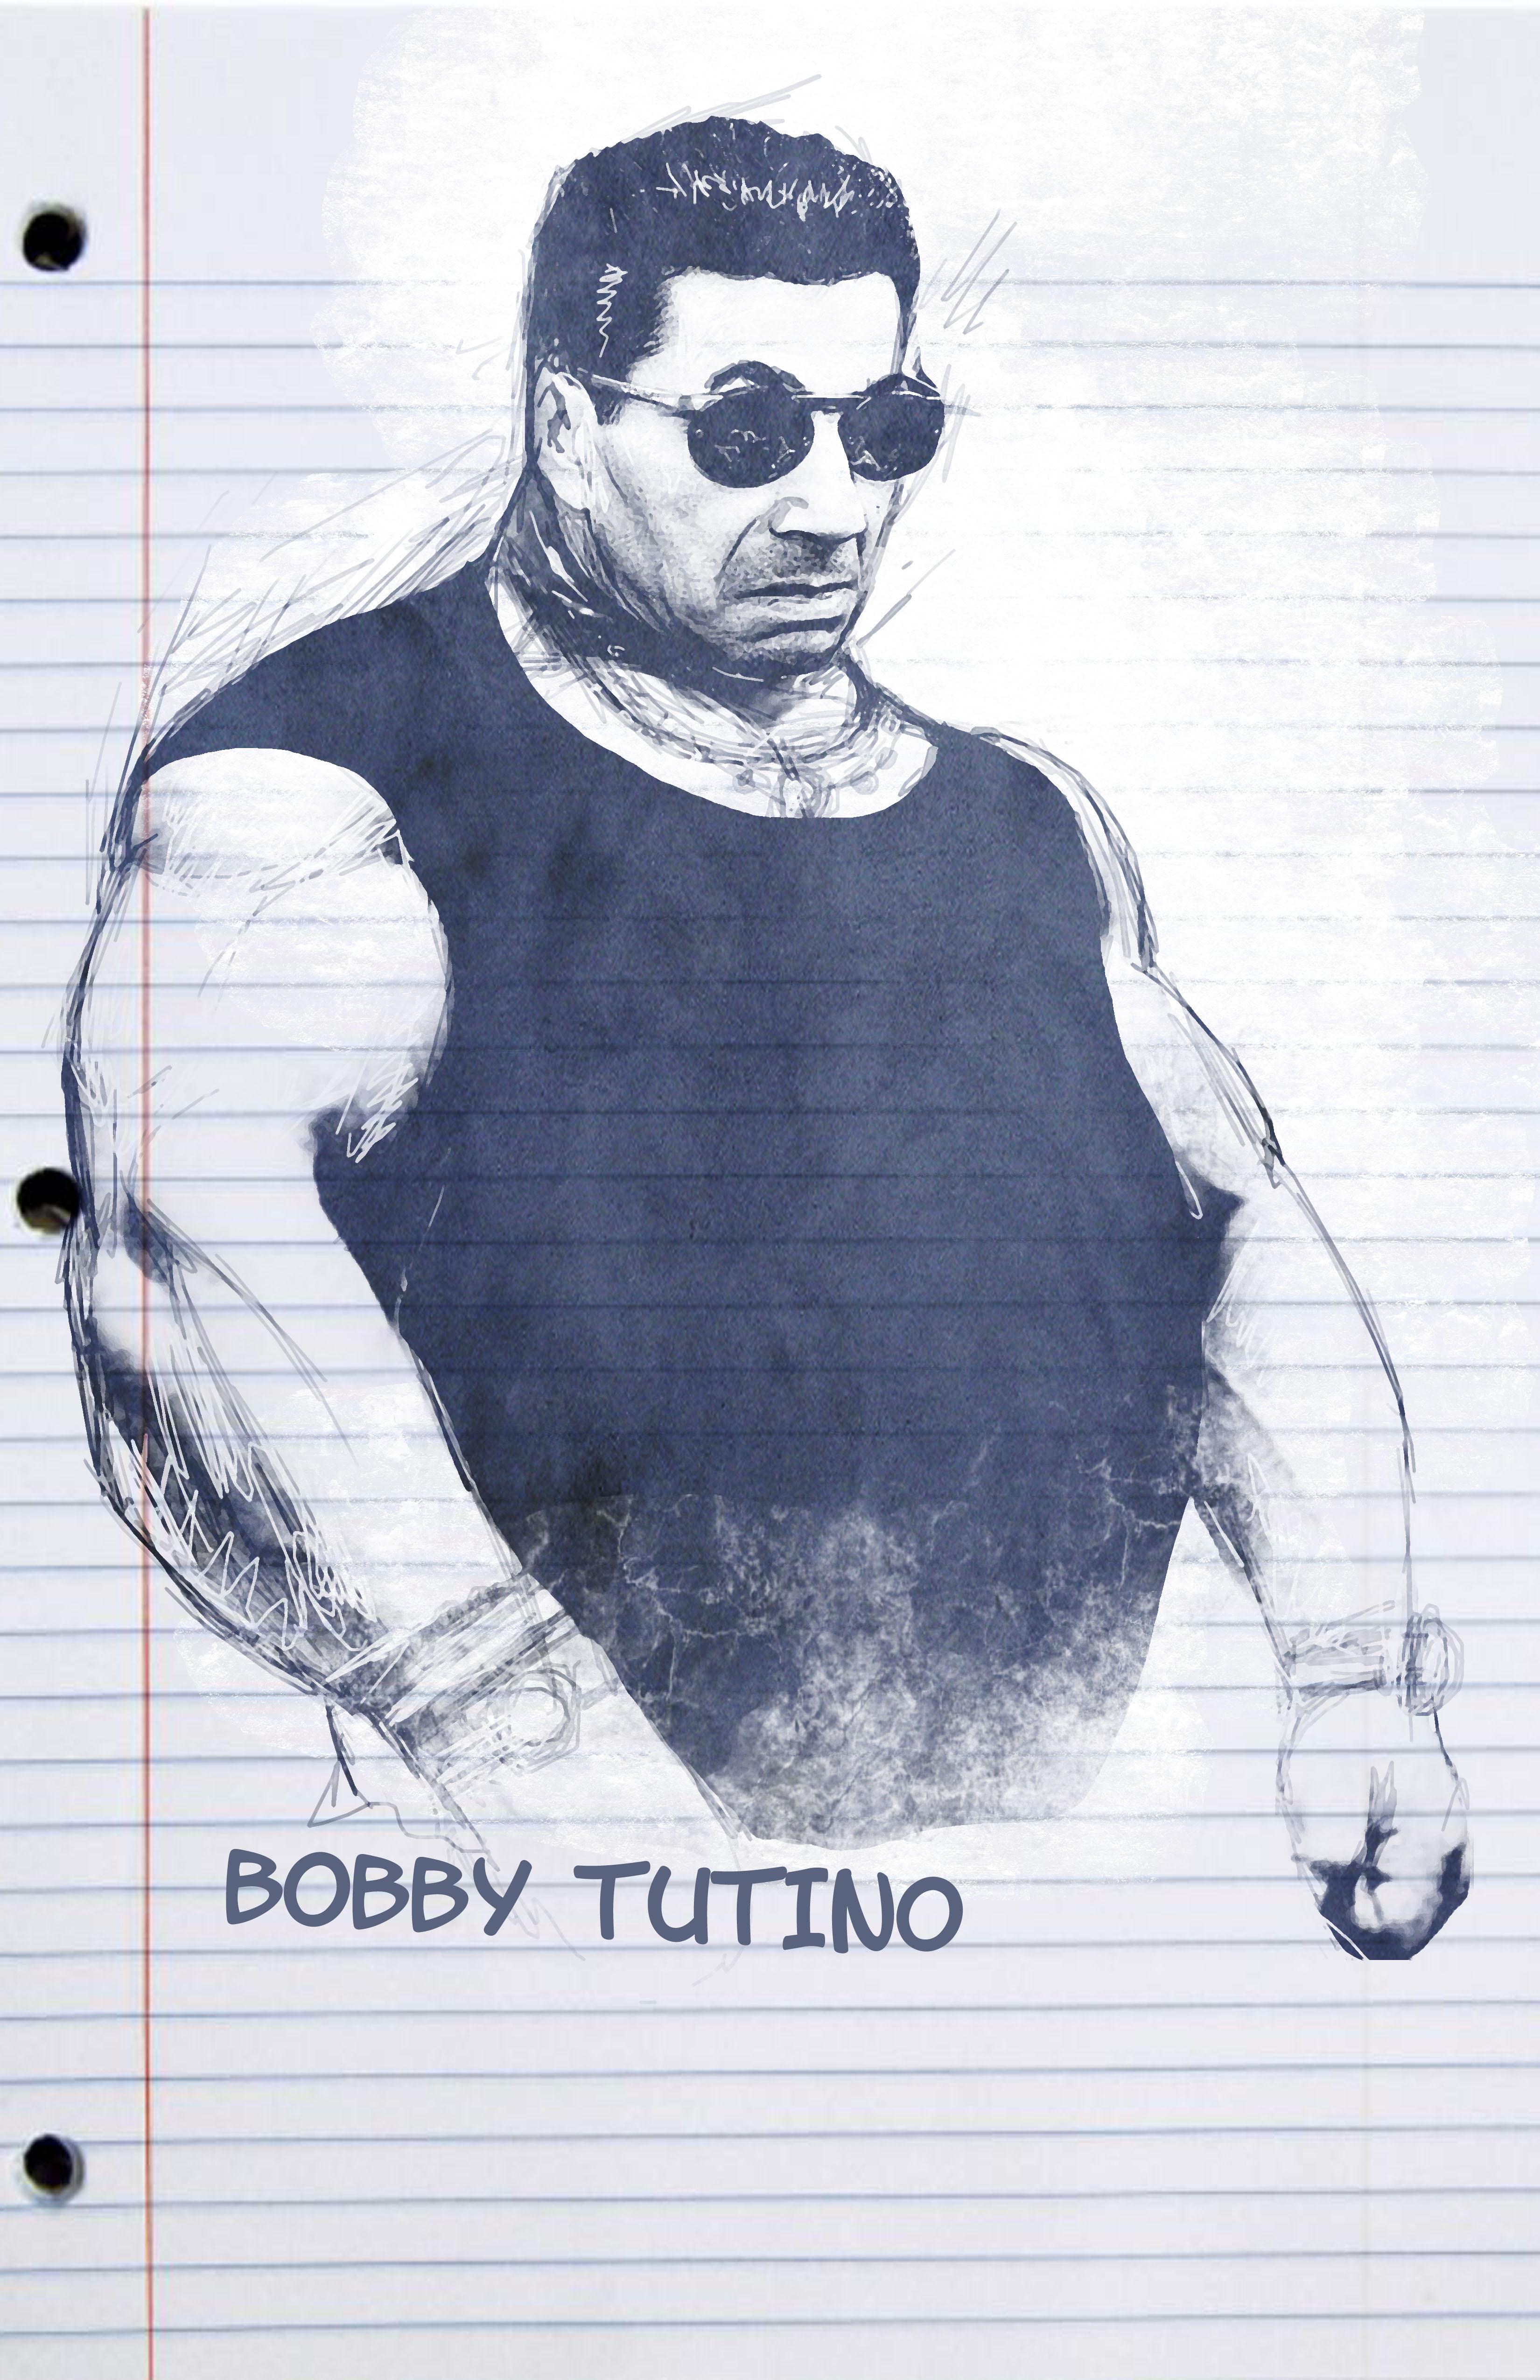 Bobby Tutino